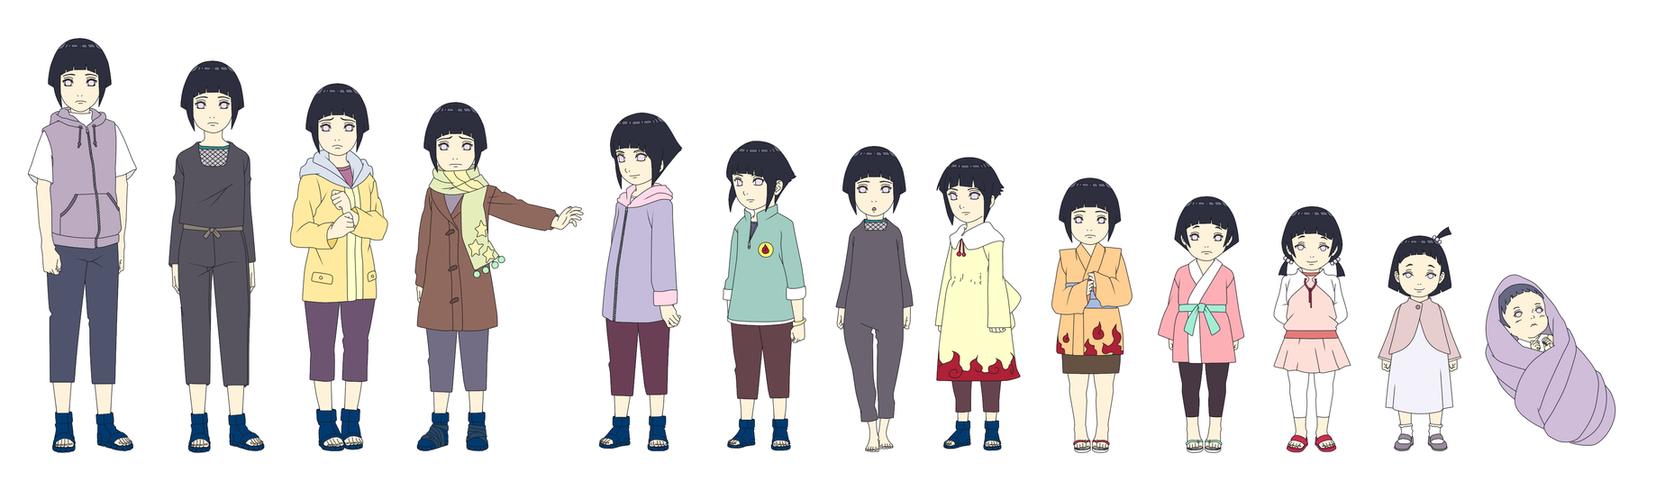 Hinata Hyuuga Outfit Color Child By Sunakisabakuno On